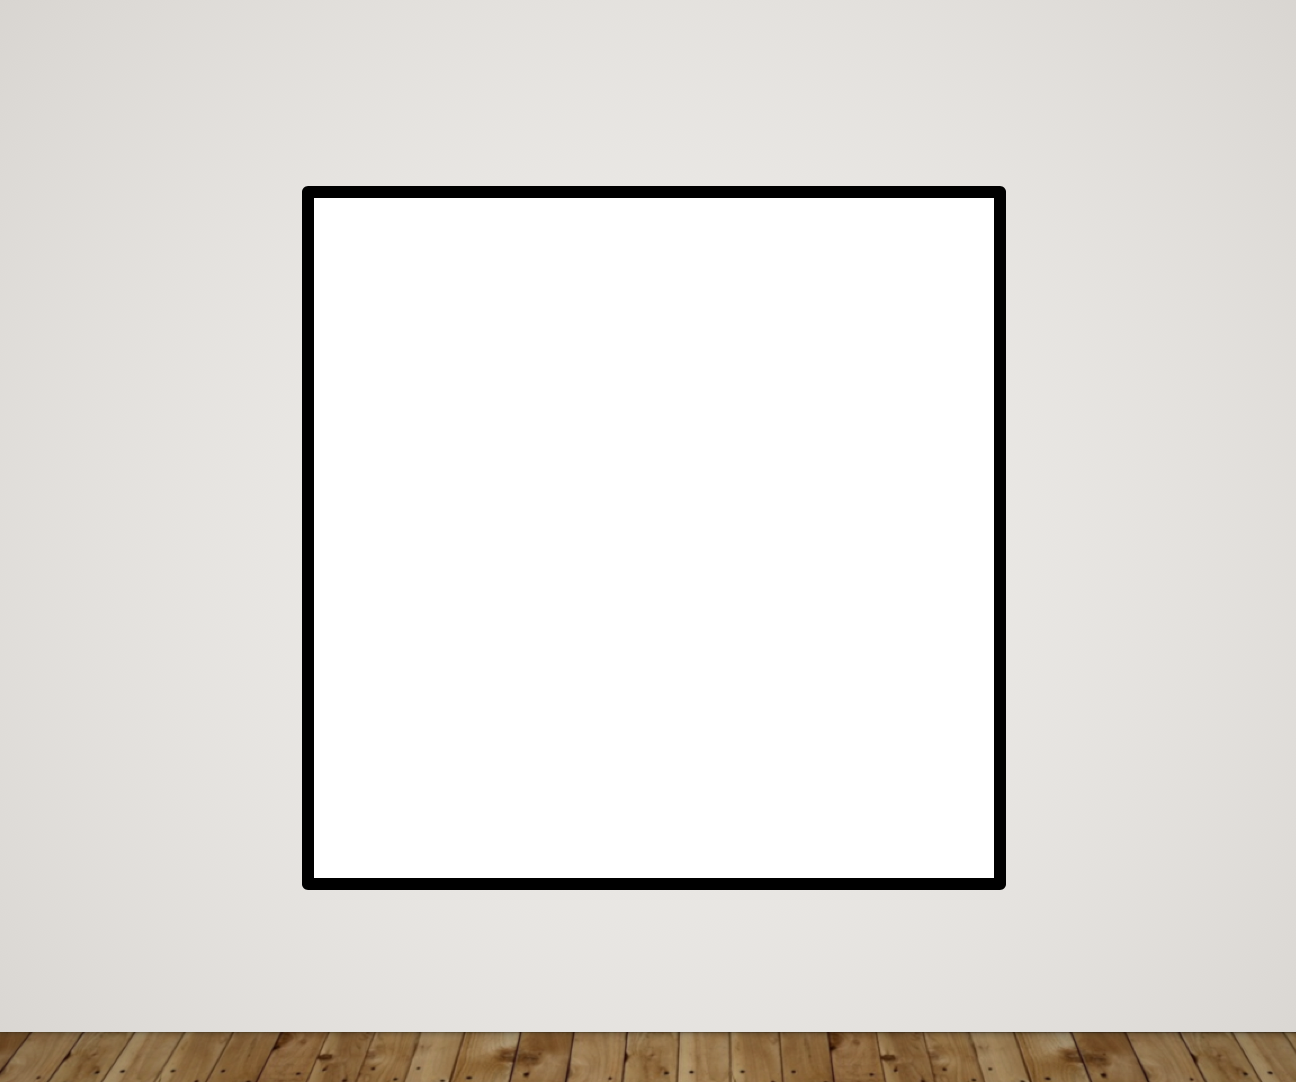 Presentation Software Animation